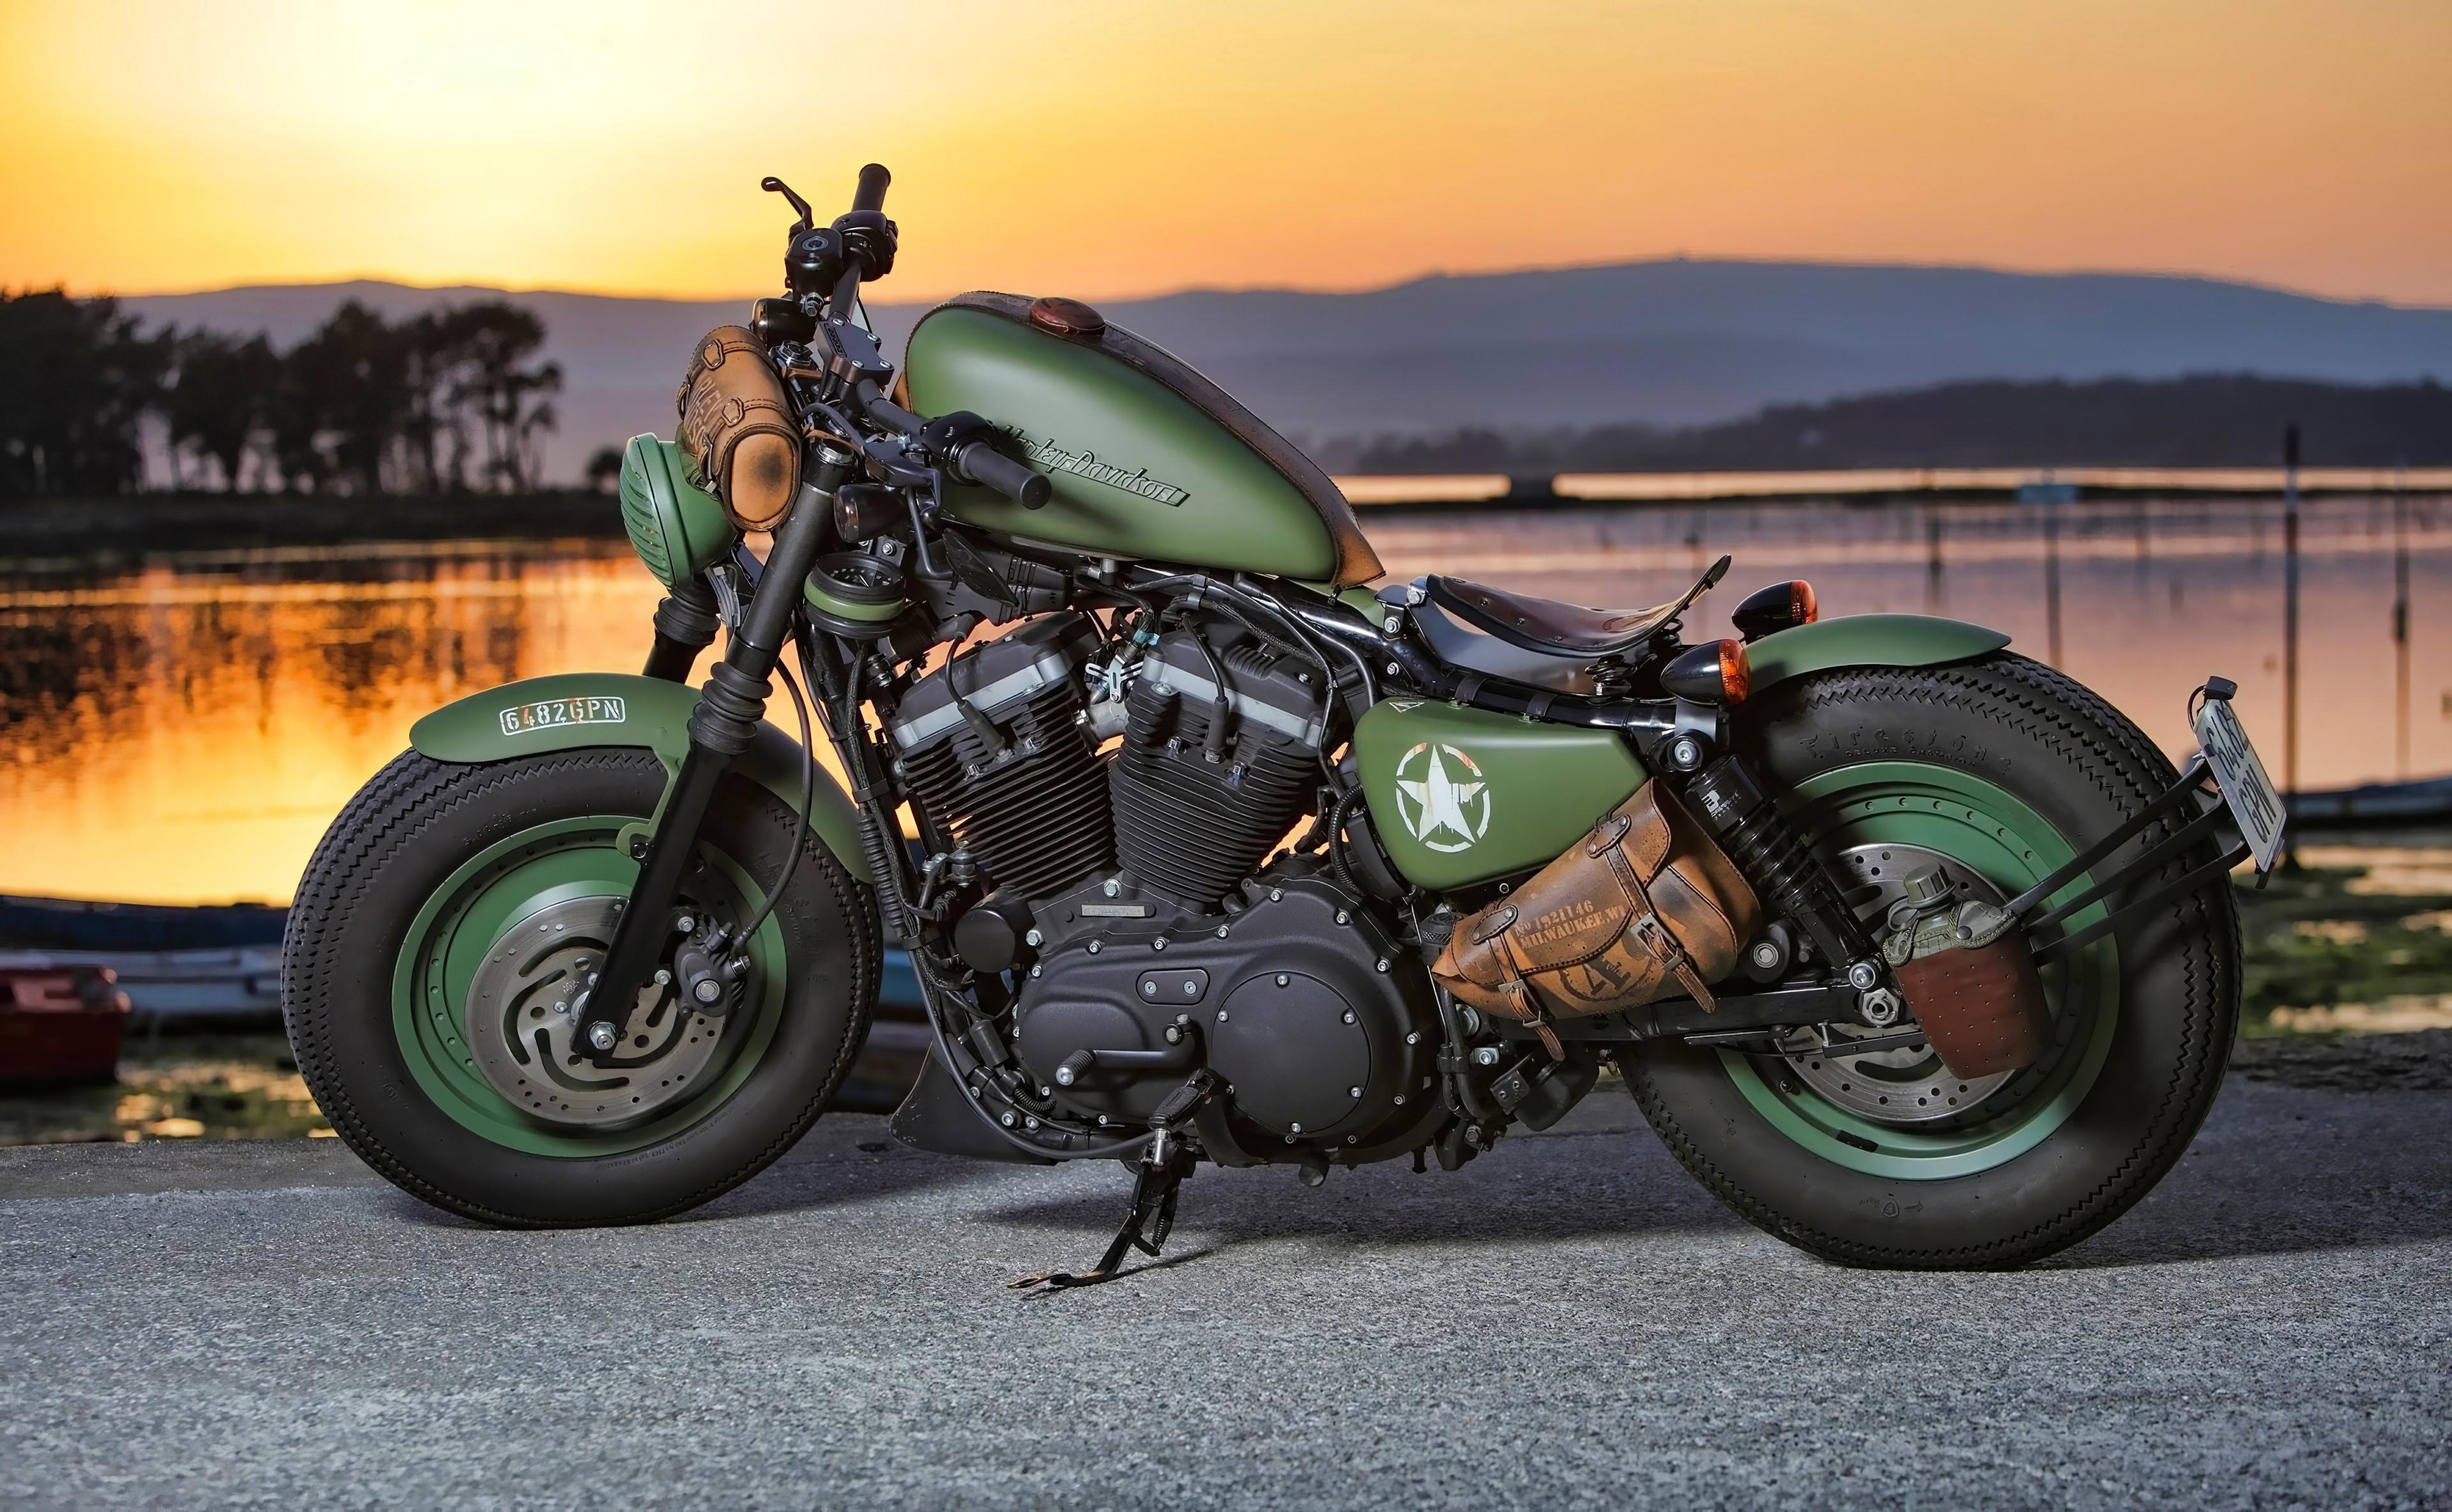 green harley davidson 1596922193 - Green Harley Davidson - harley davidson green wallpapers 4k, Green Harley Davidson wallpapers, Green Harley Davidson 4k wallpapers